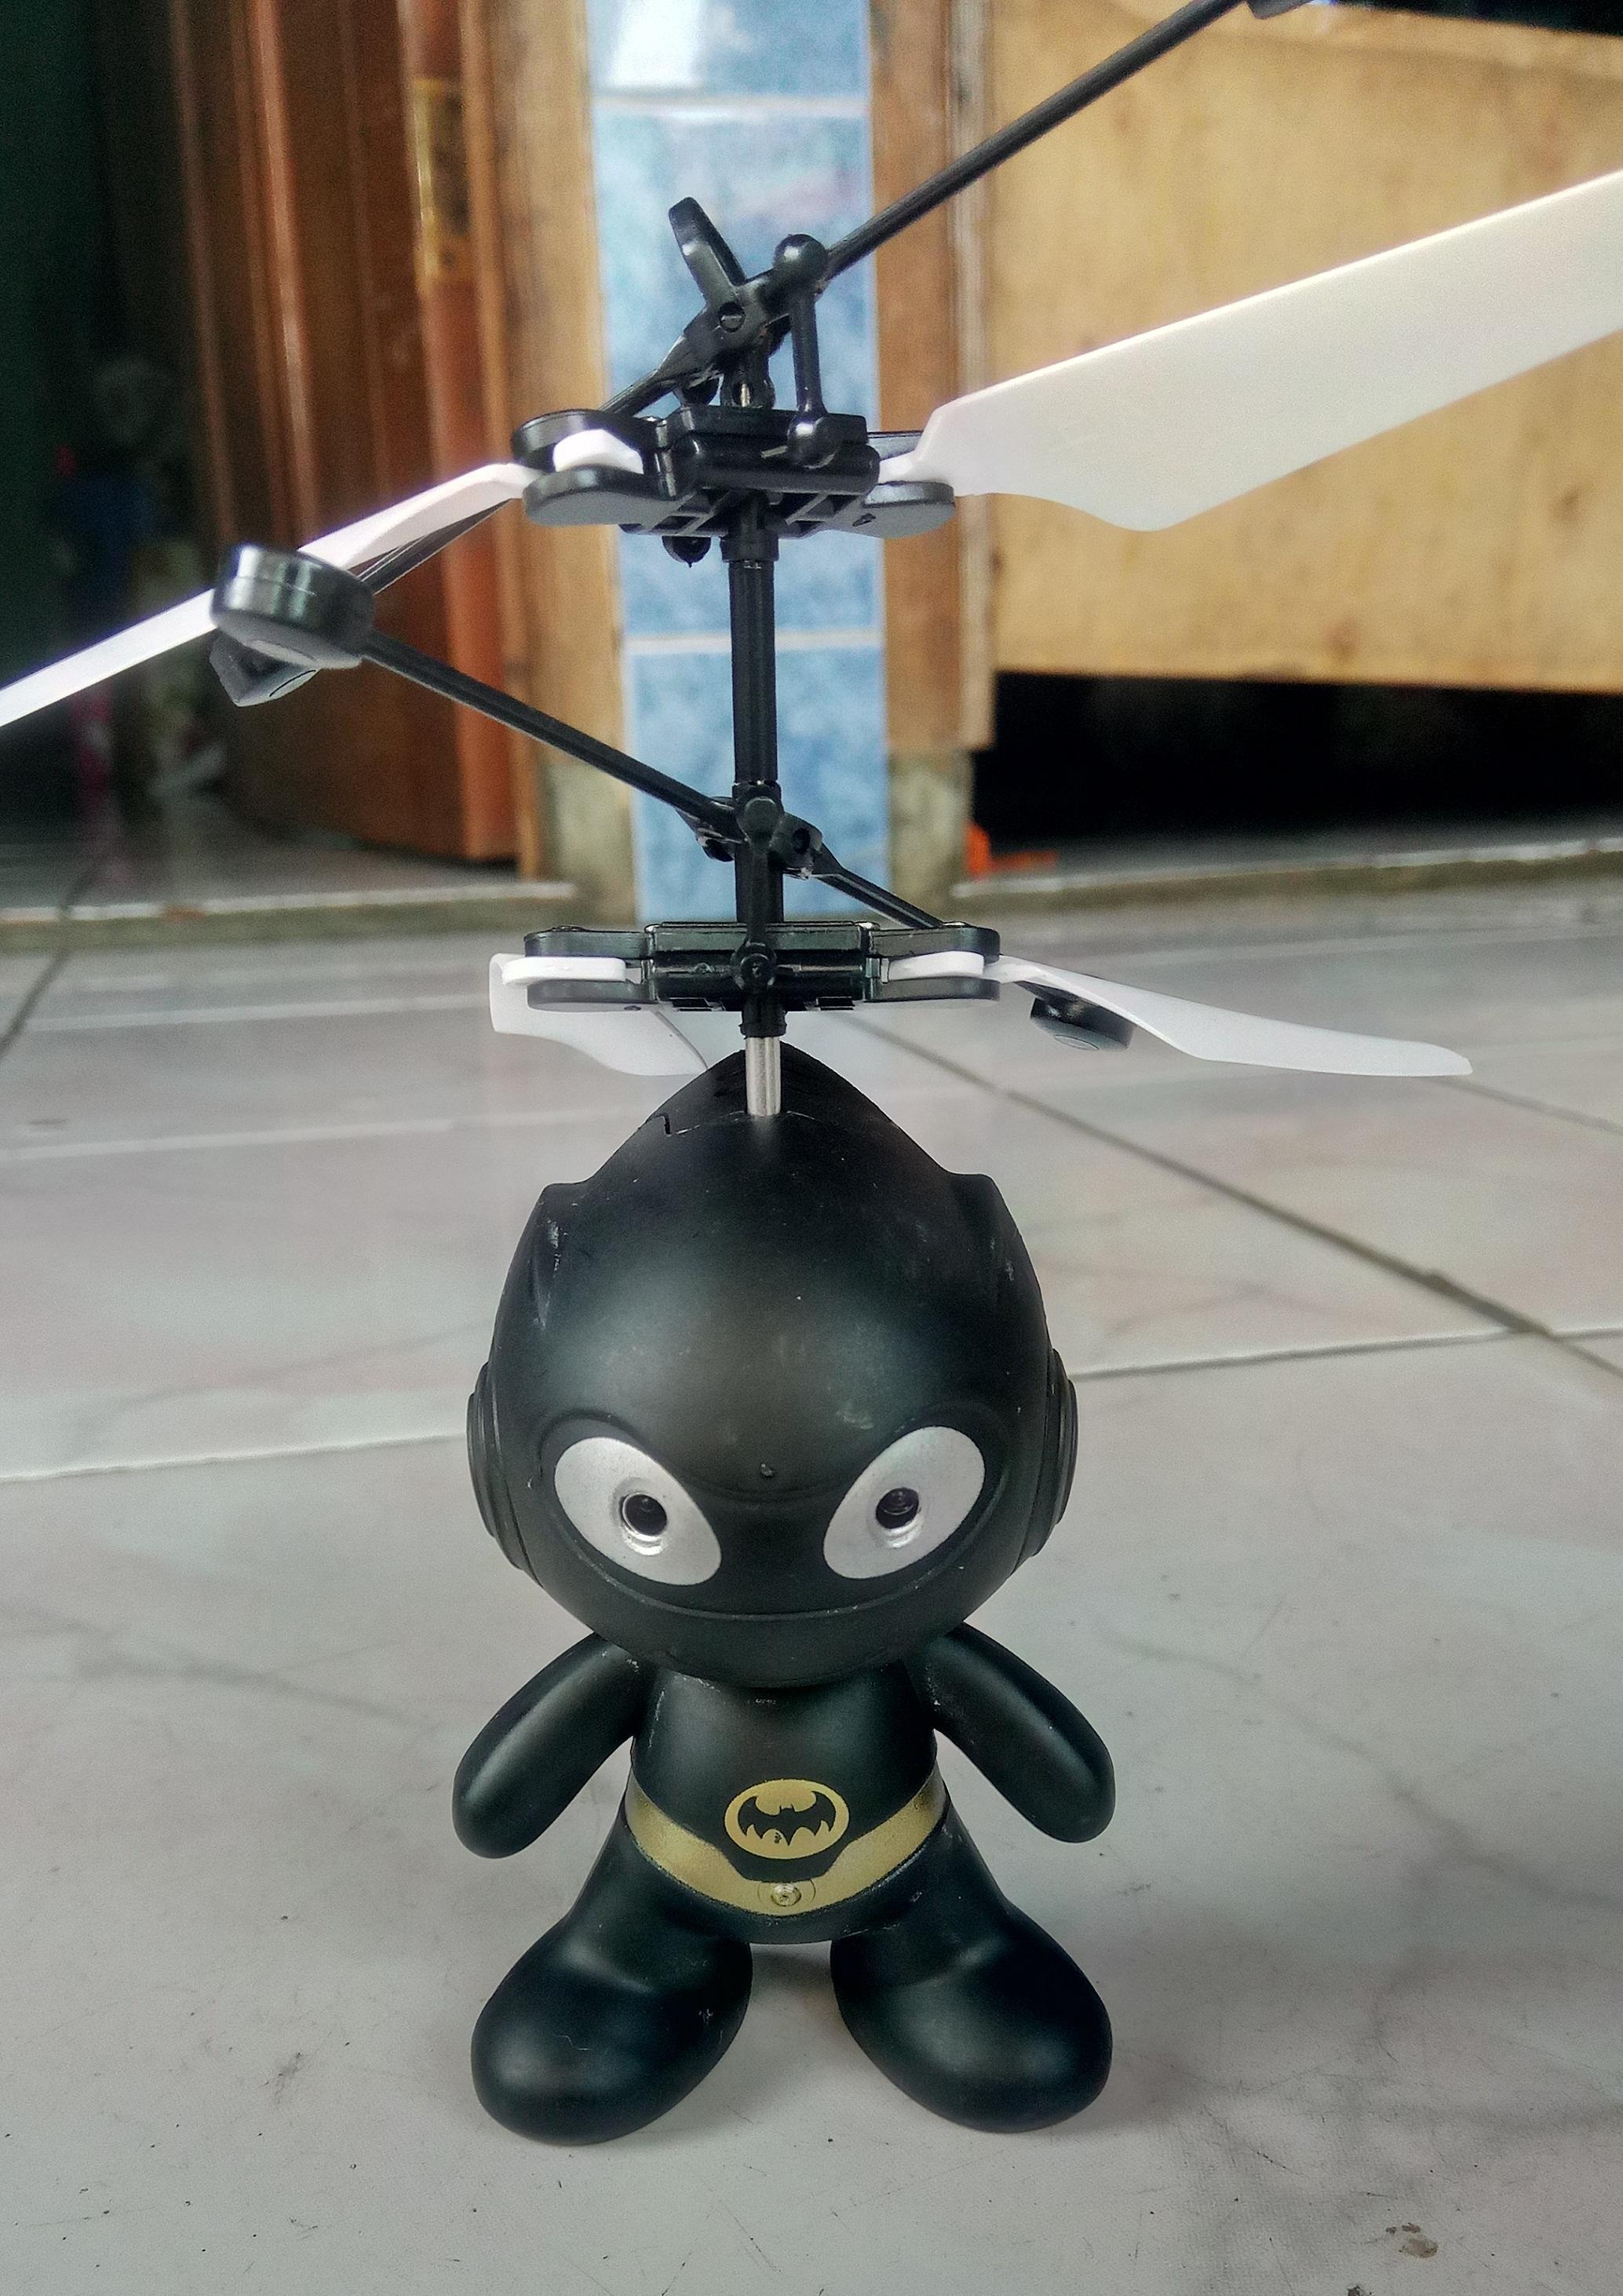 Flying heli / Mainan Anak Terbang Drone Sensor Tangan